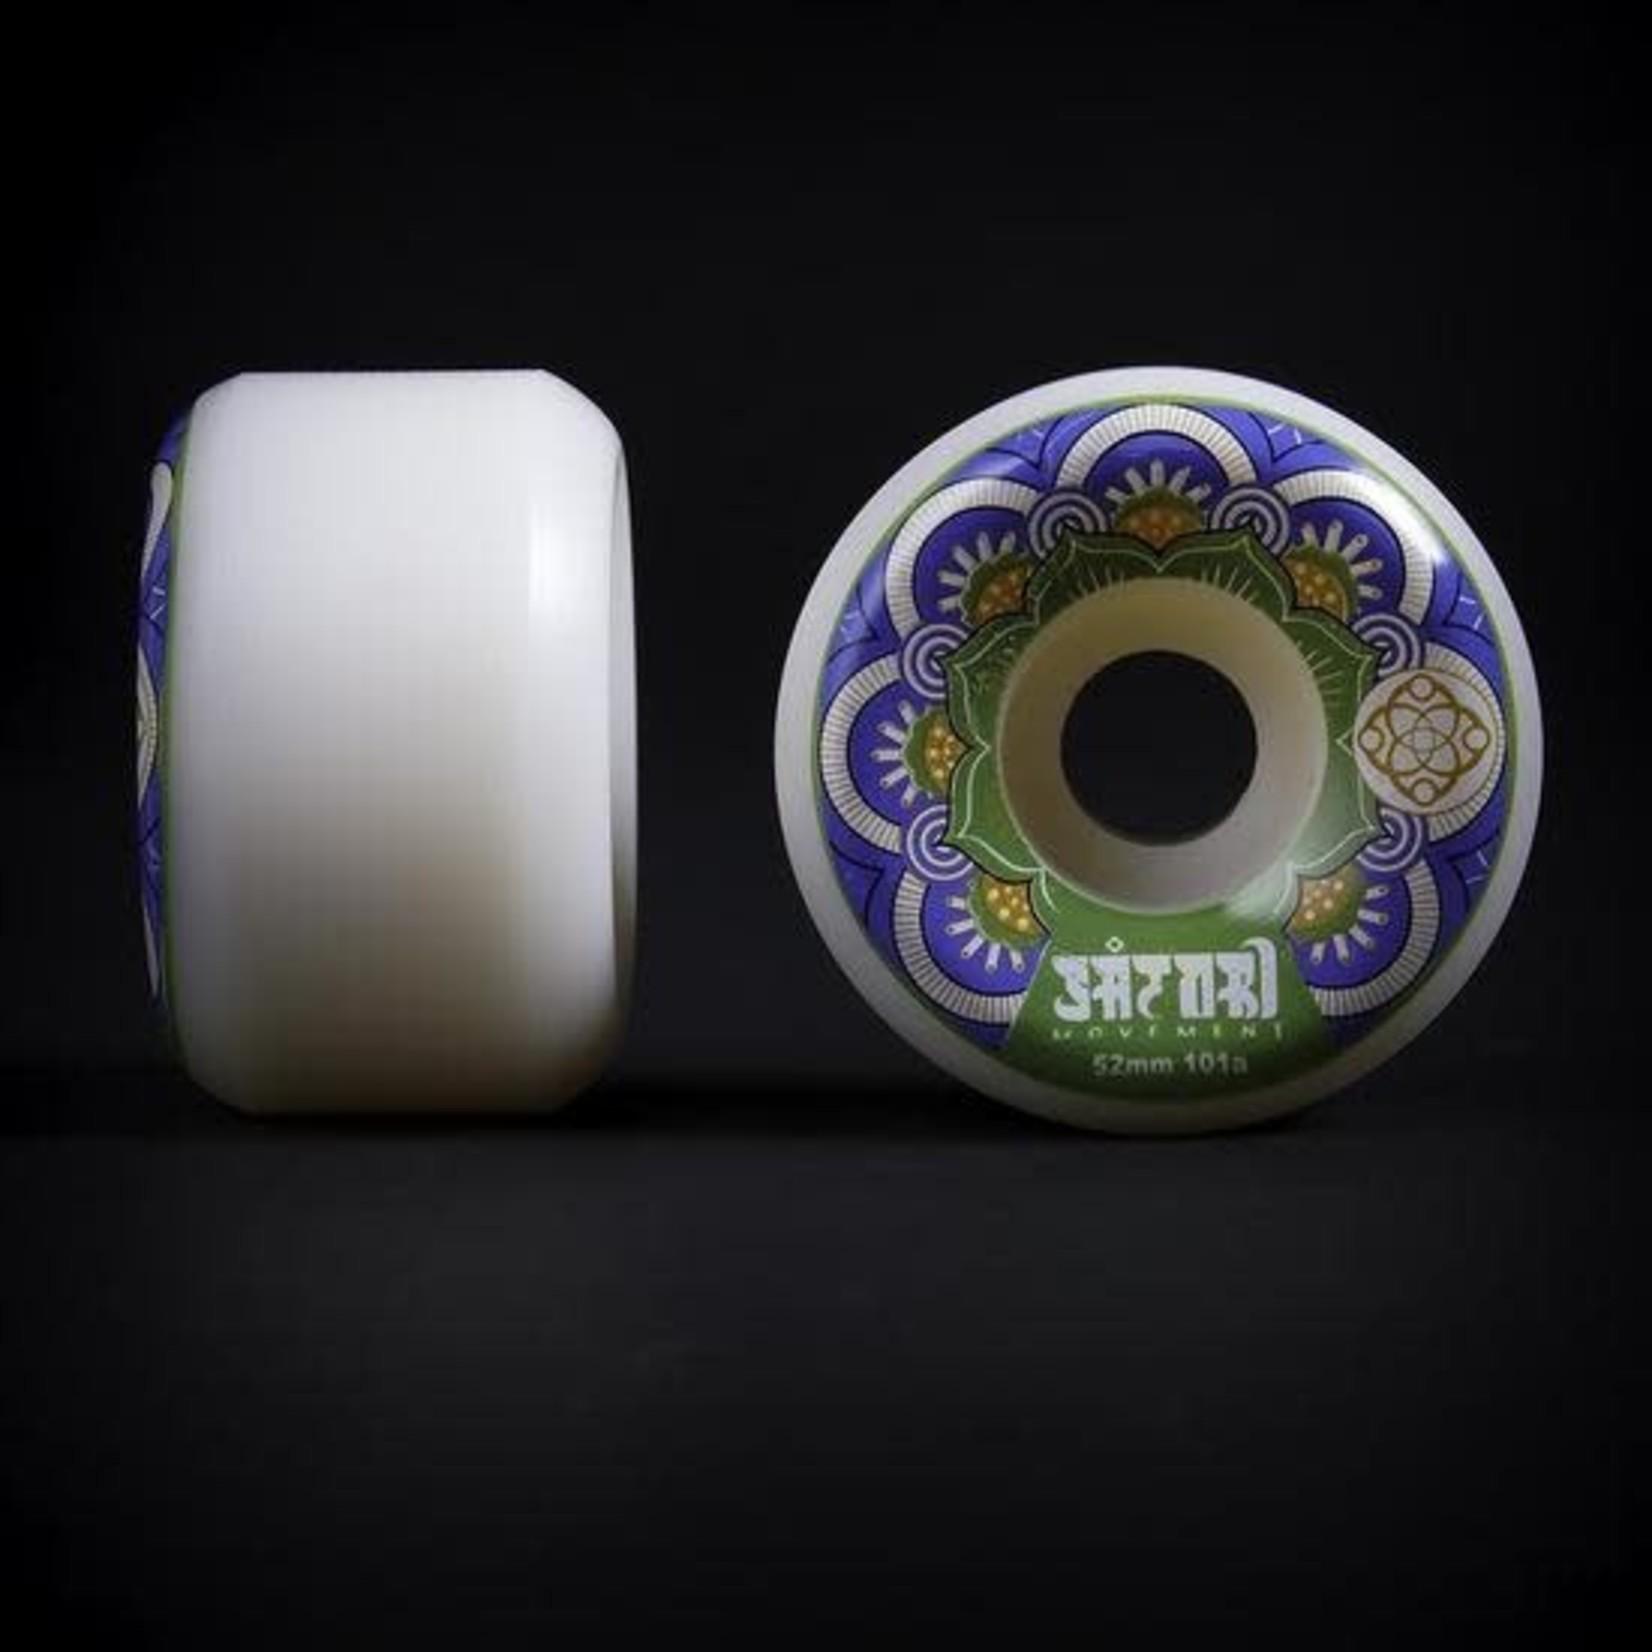 Wheels - Satori Conical,